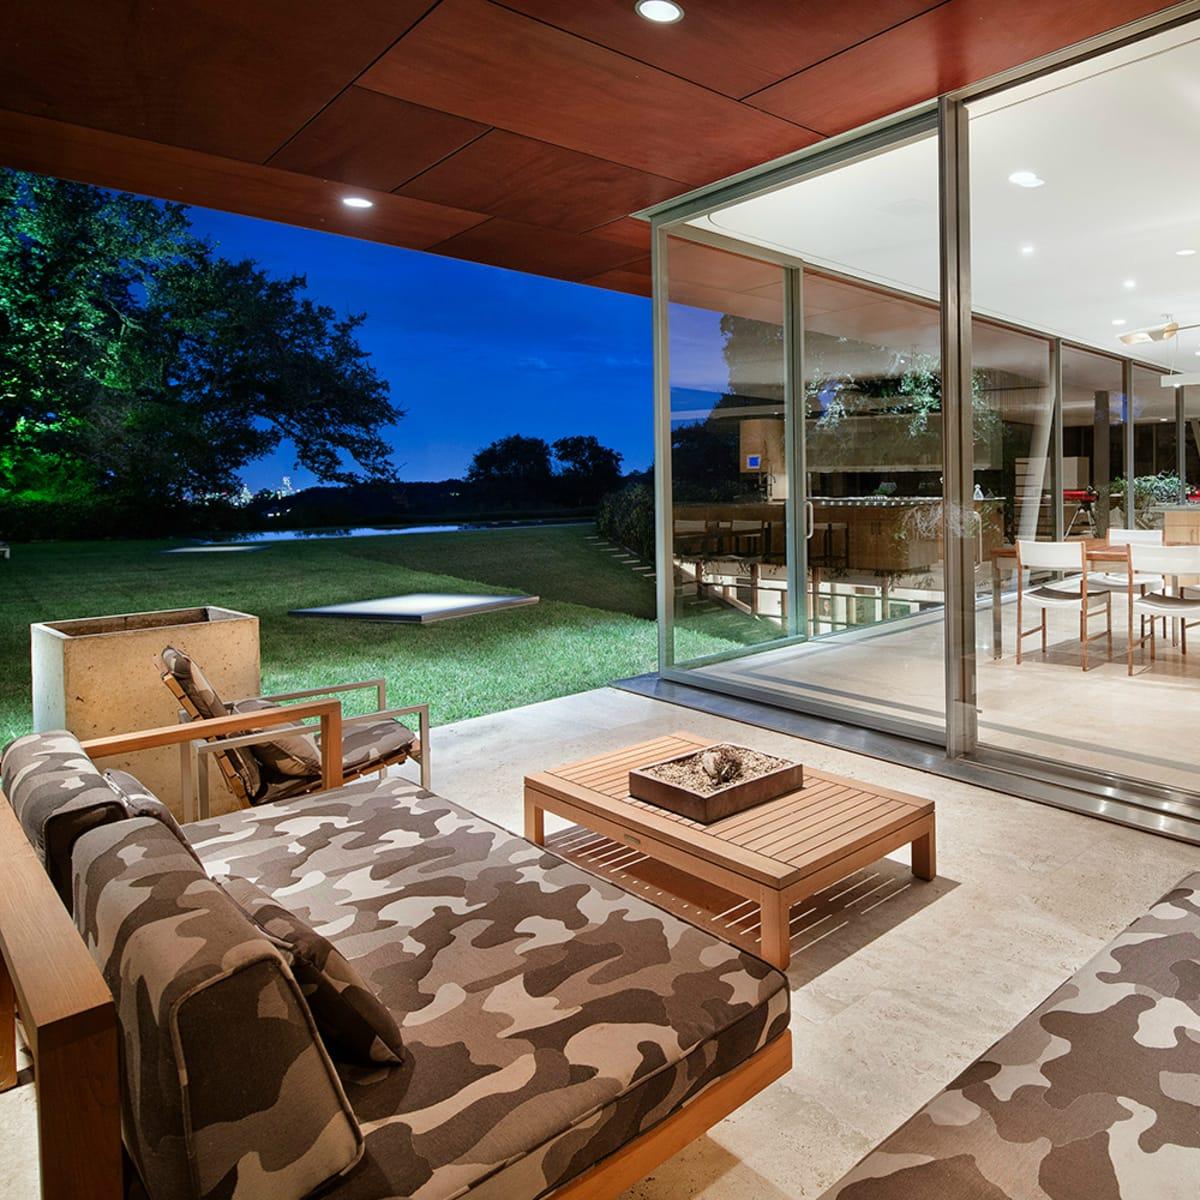 Austin home Floating Box House 900 Live Oak Circle West Lake Hills 78746 April 2016 patio ground level